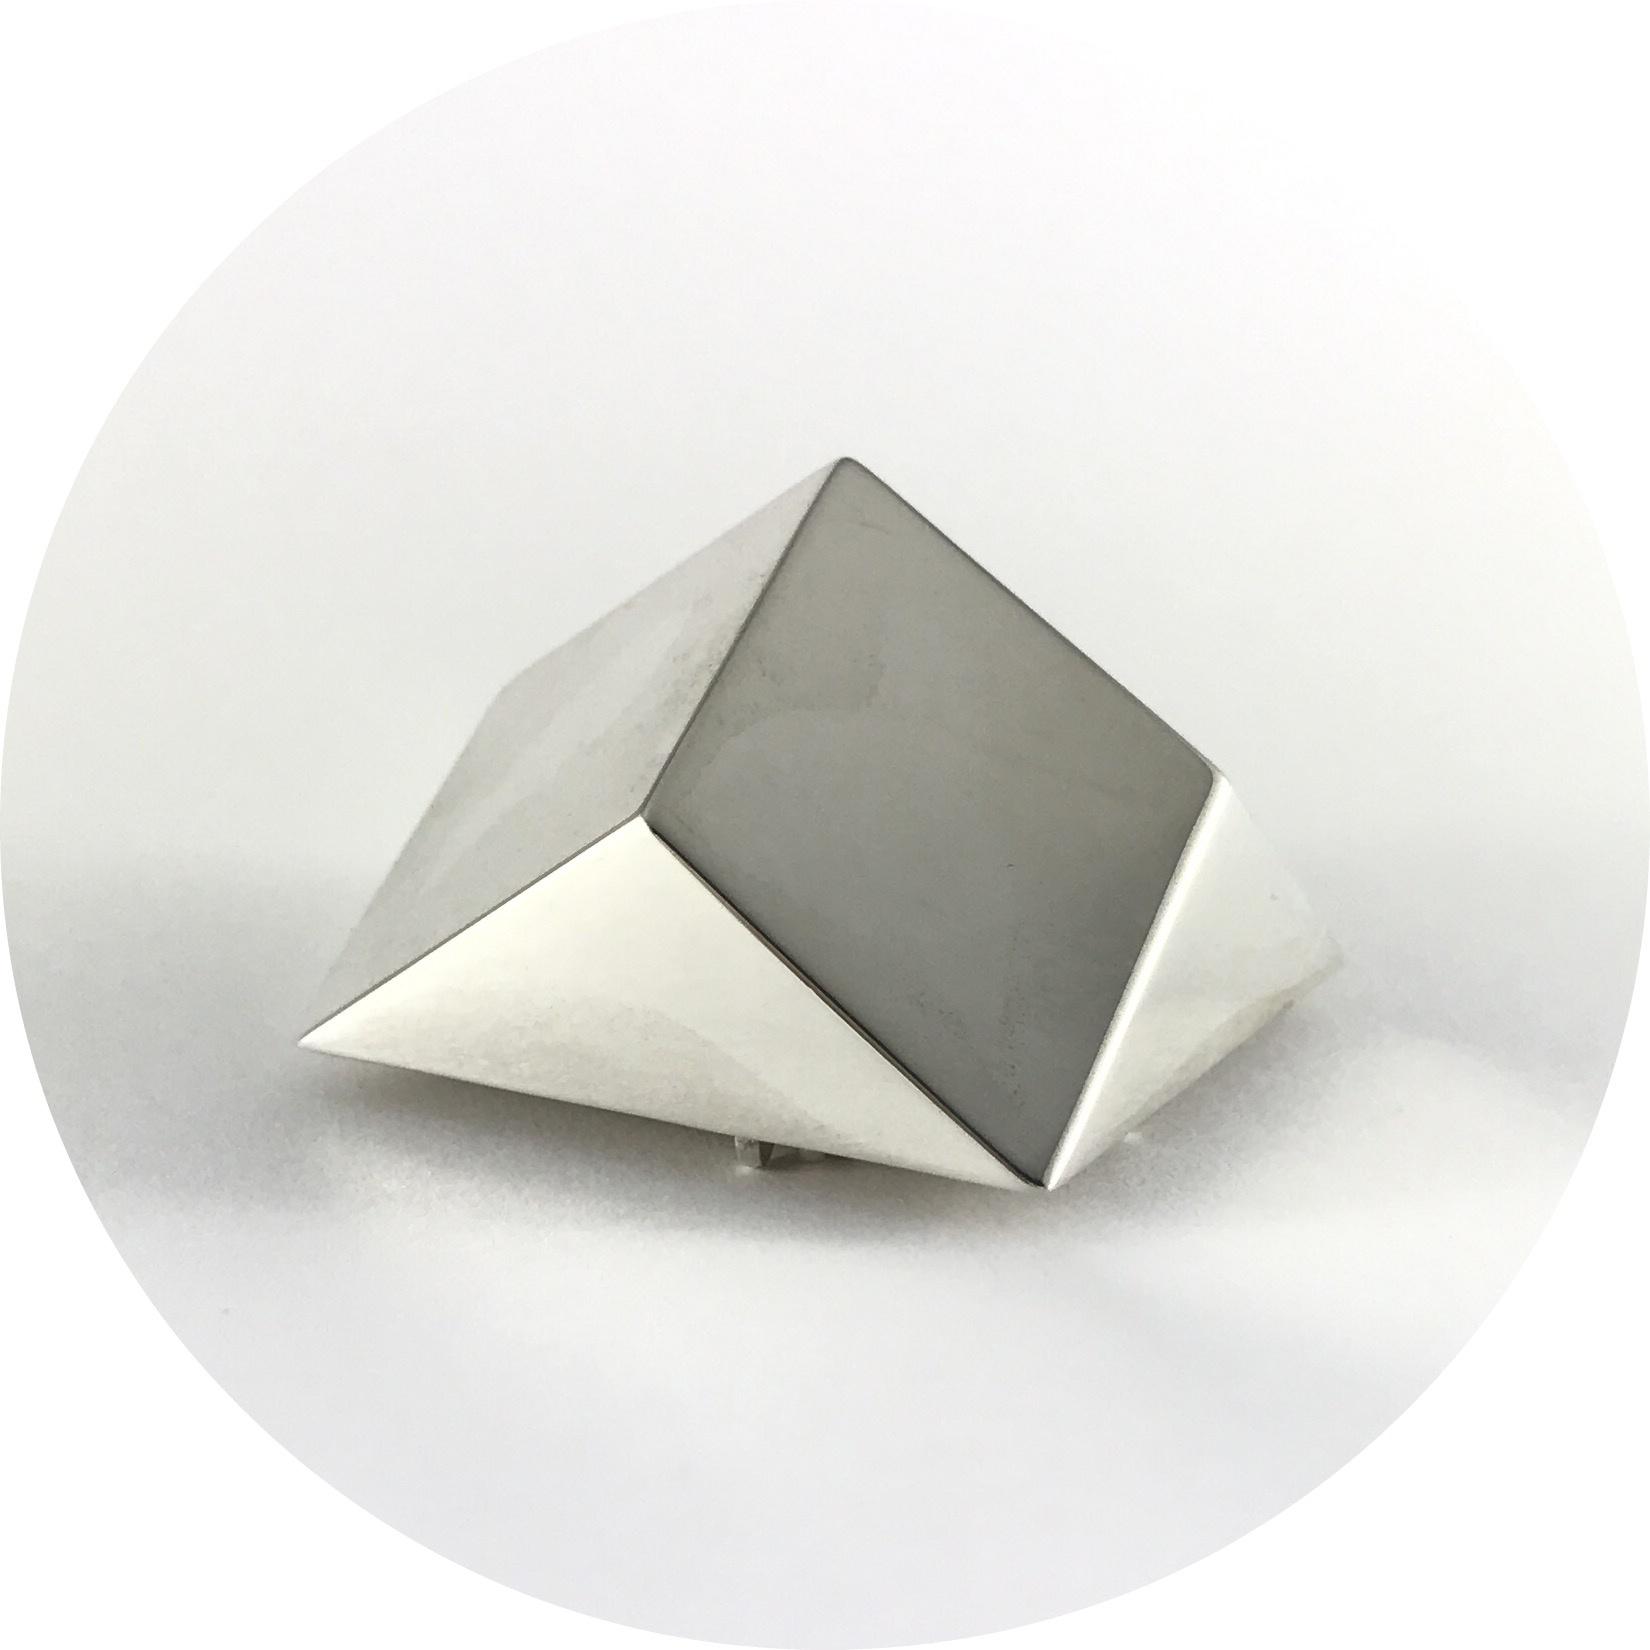 Danielle Kathleen - 'Crystal Geometries' Sterling Silver Brooch I